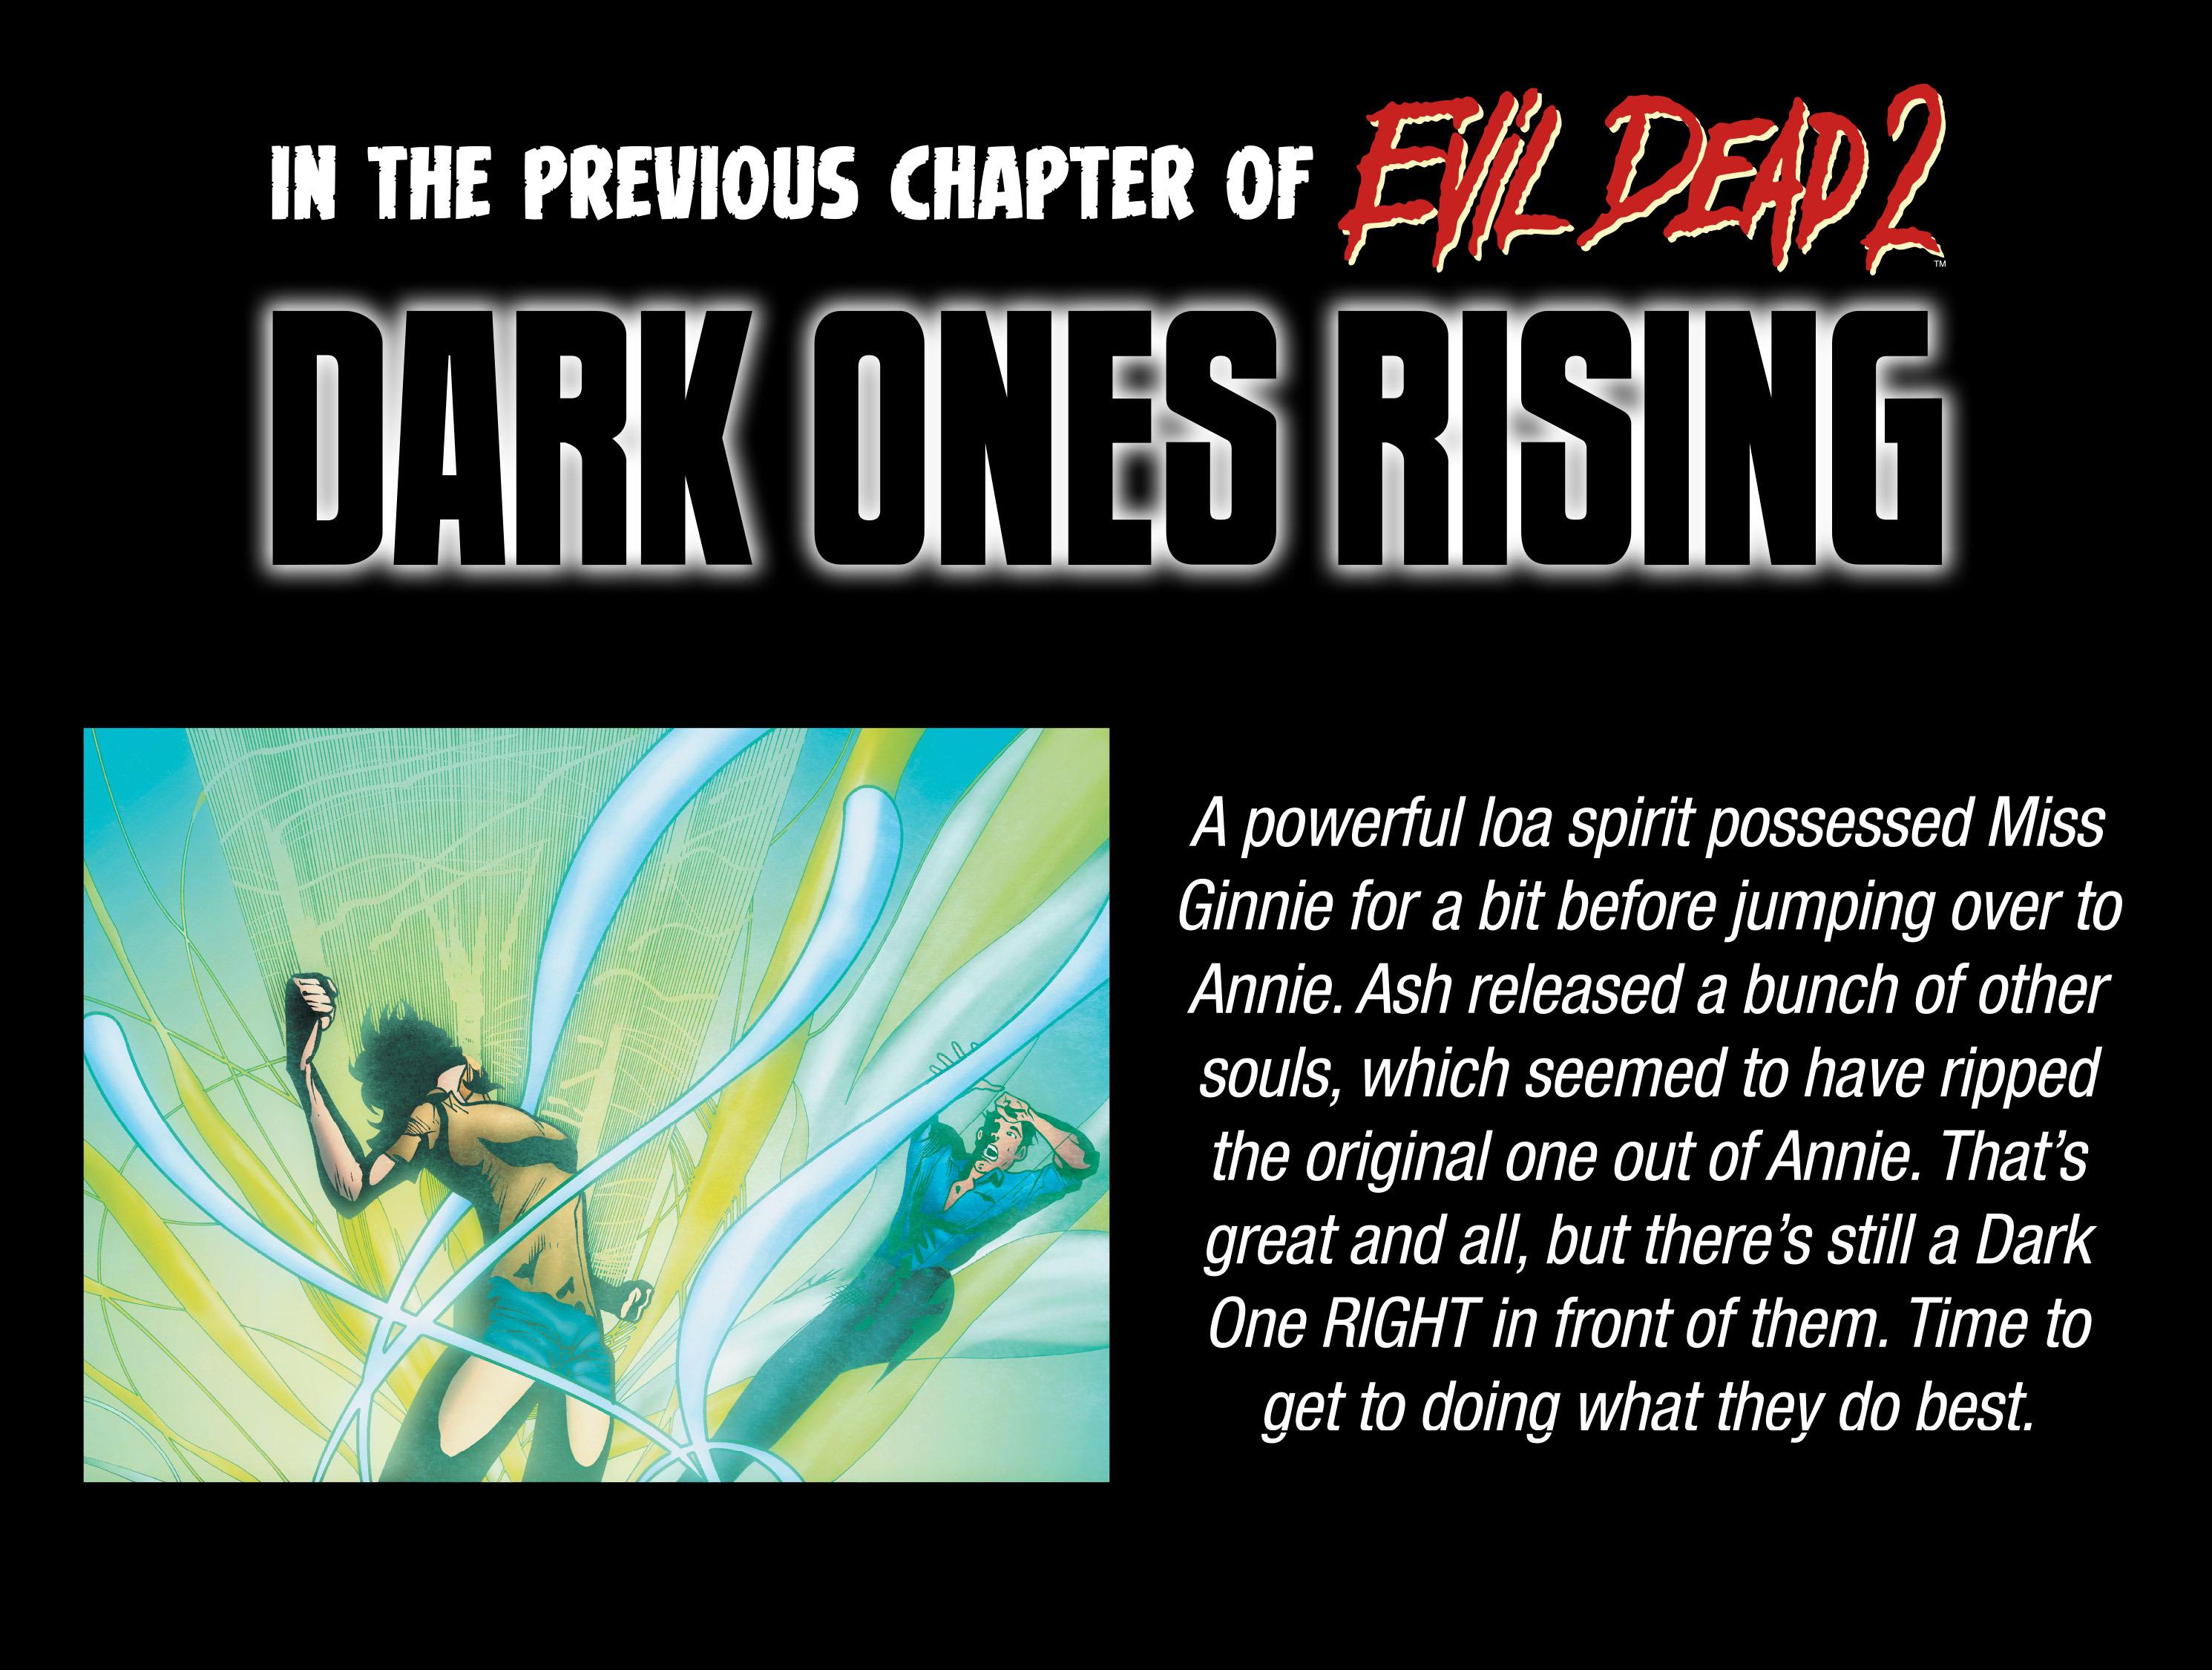 Read online Evil Dead 2: Dark Ones Rising comic -  Issue #5 - 3